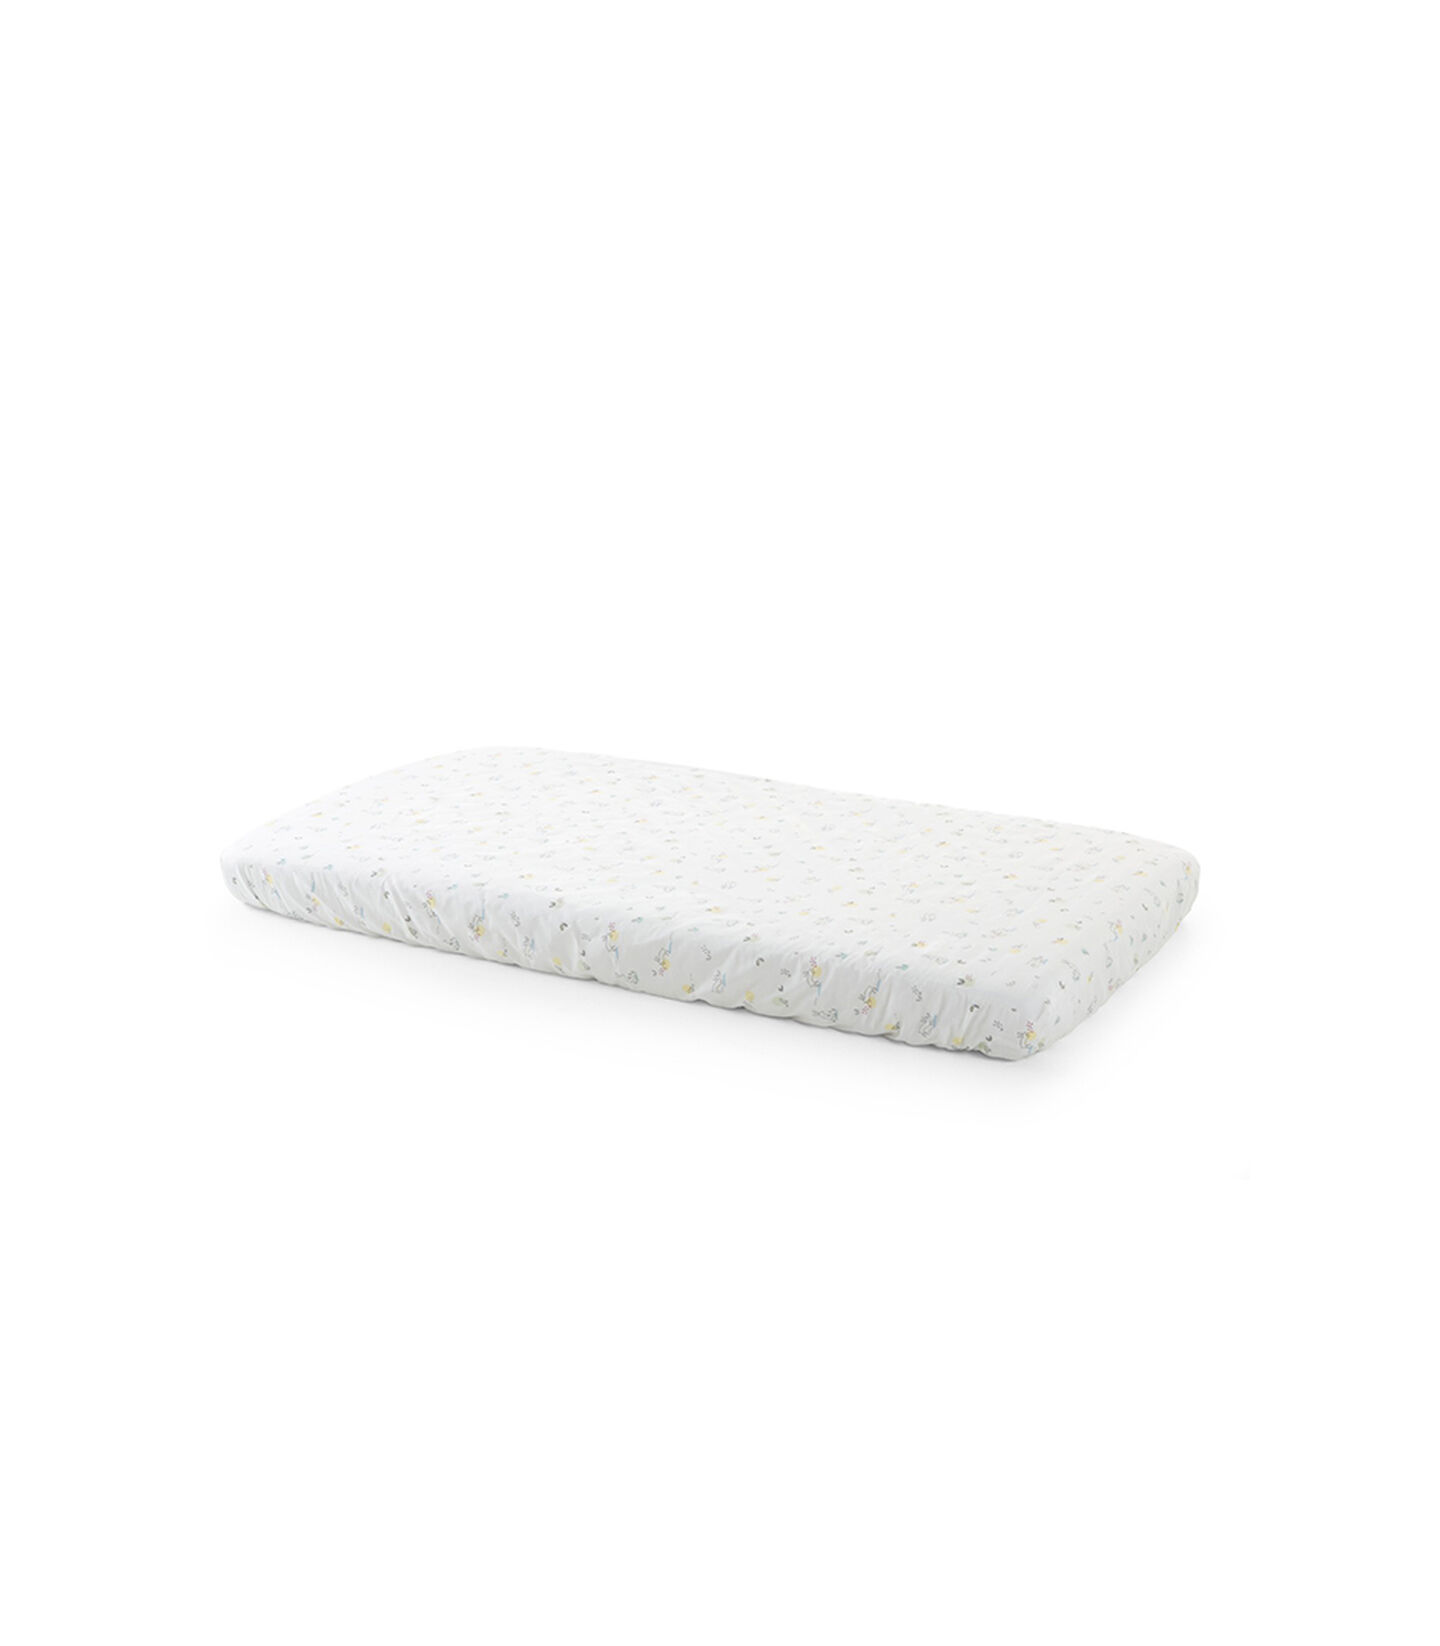 Stokke® Home™ Seng Laken 2pc - Soft Rabbit, Soft Rabbit, mainview view 2